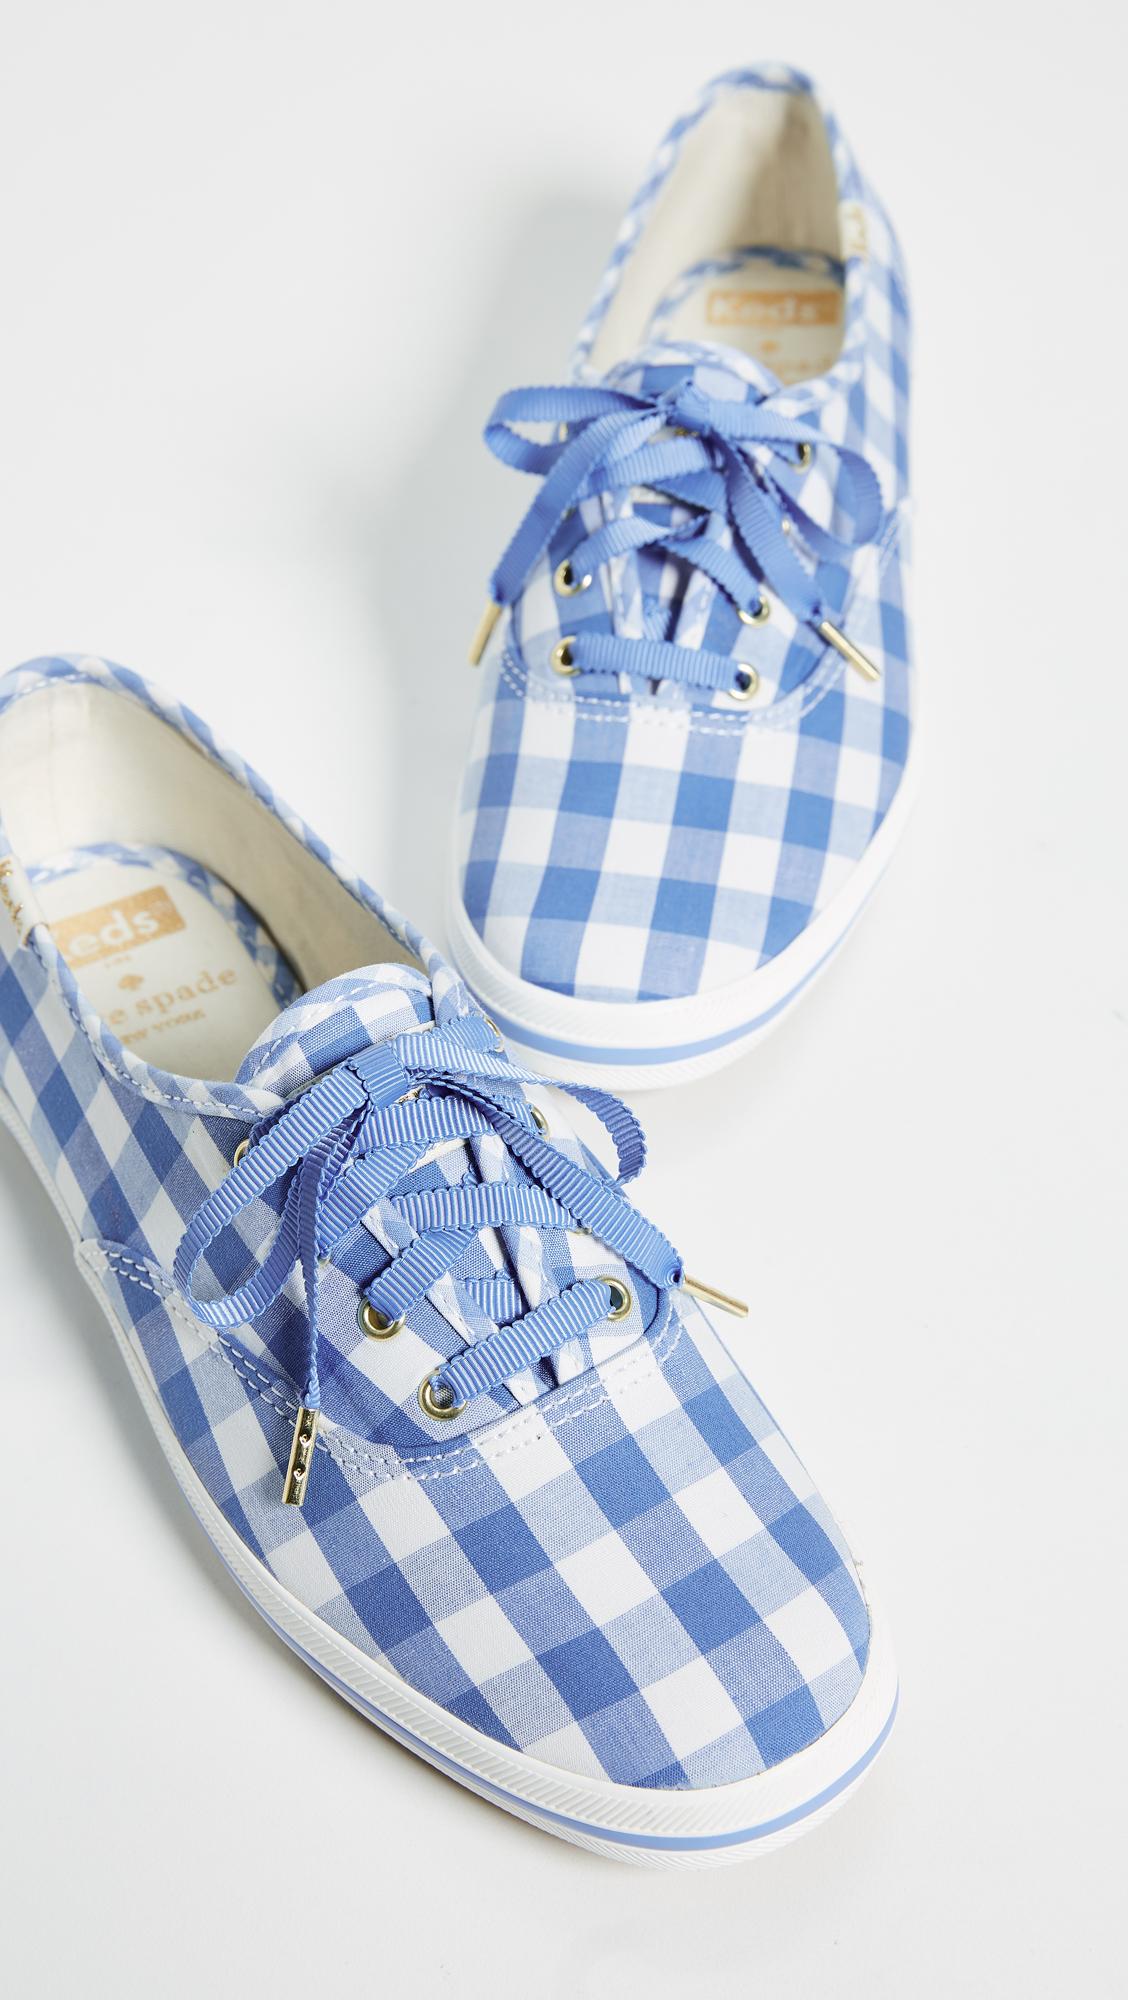 1c7841b9d858d Keds x Kate Spade New York Gingham Sneakers